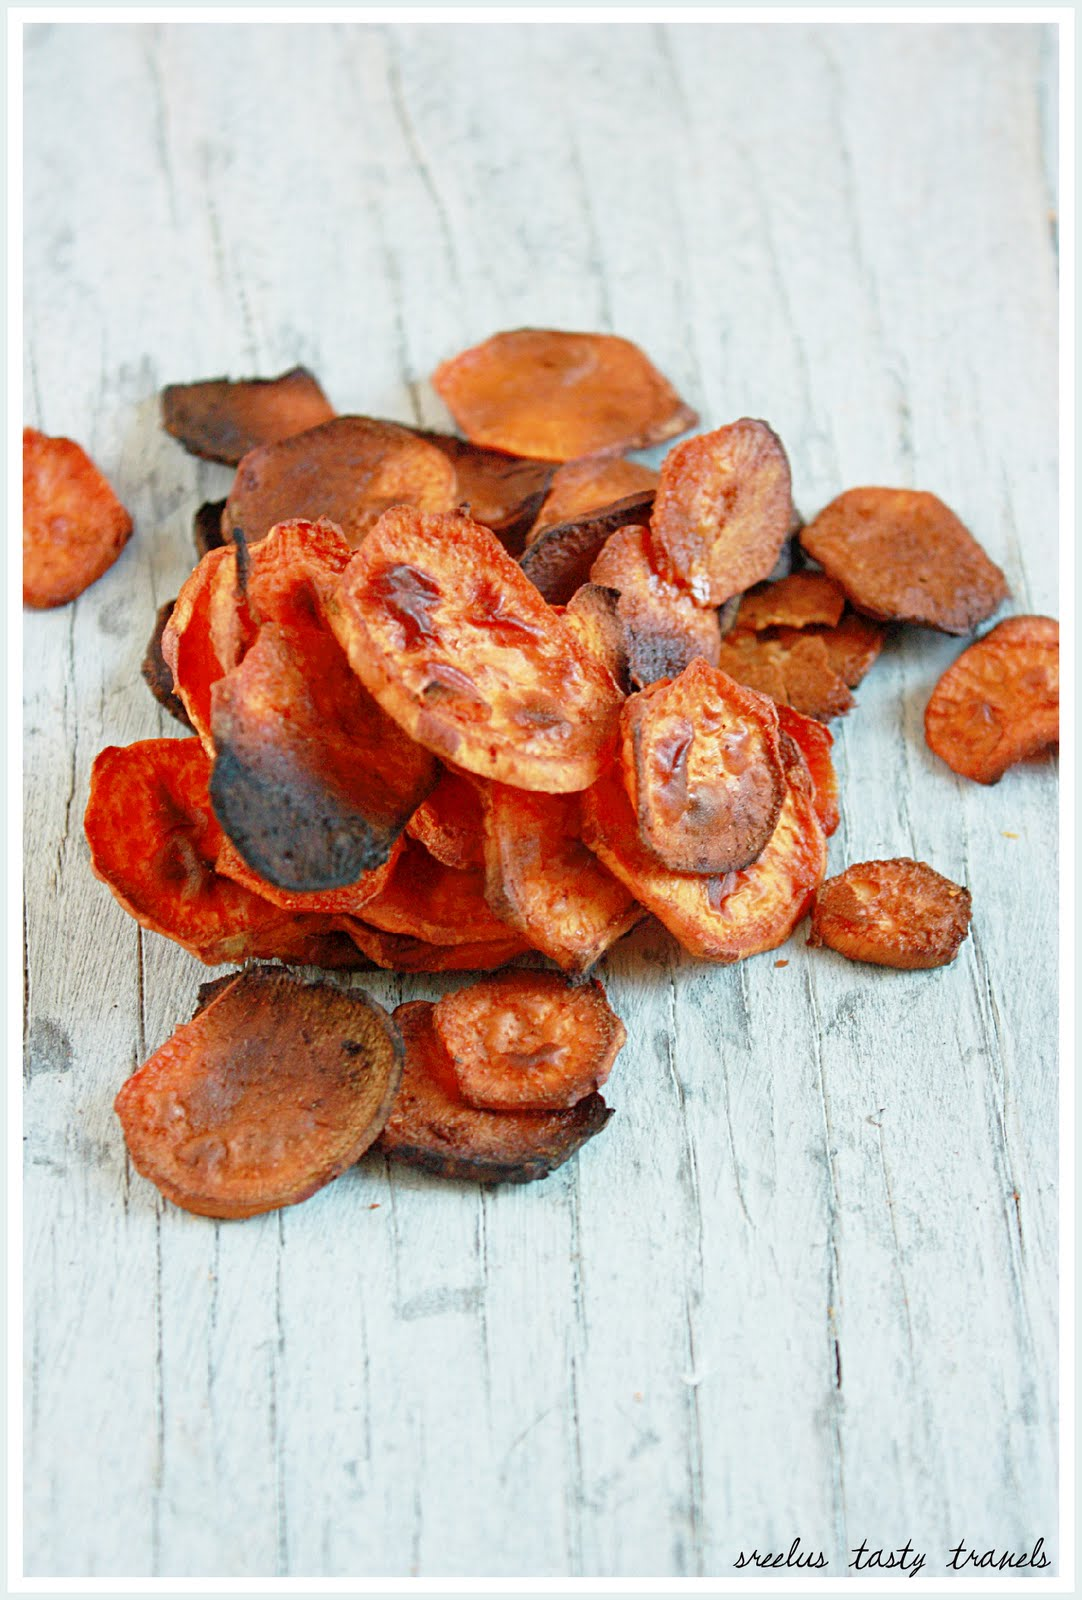 Sreelus Tasty Travels: Baked Sweet Potato Chips - Sweet ...